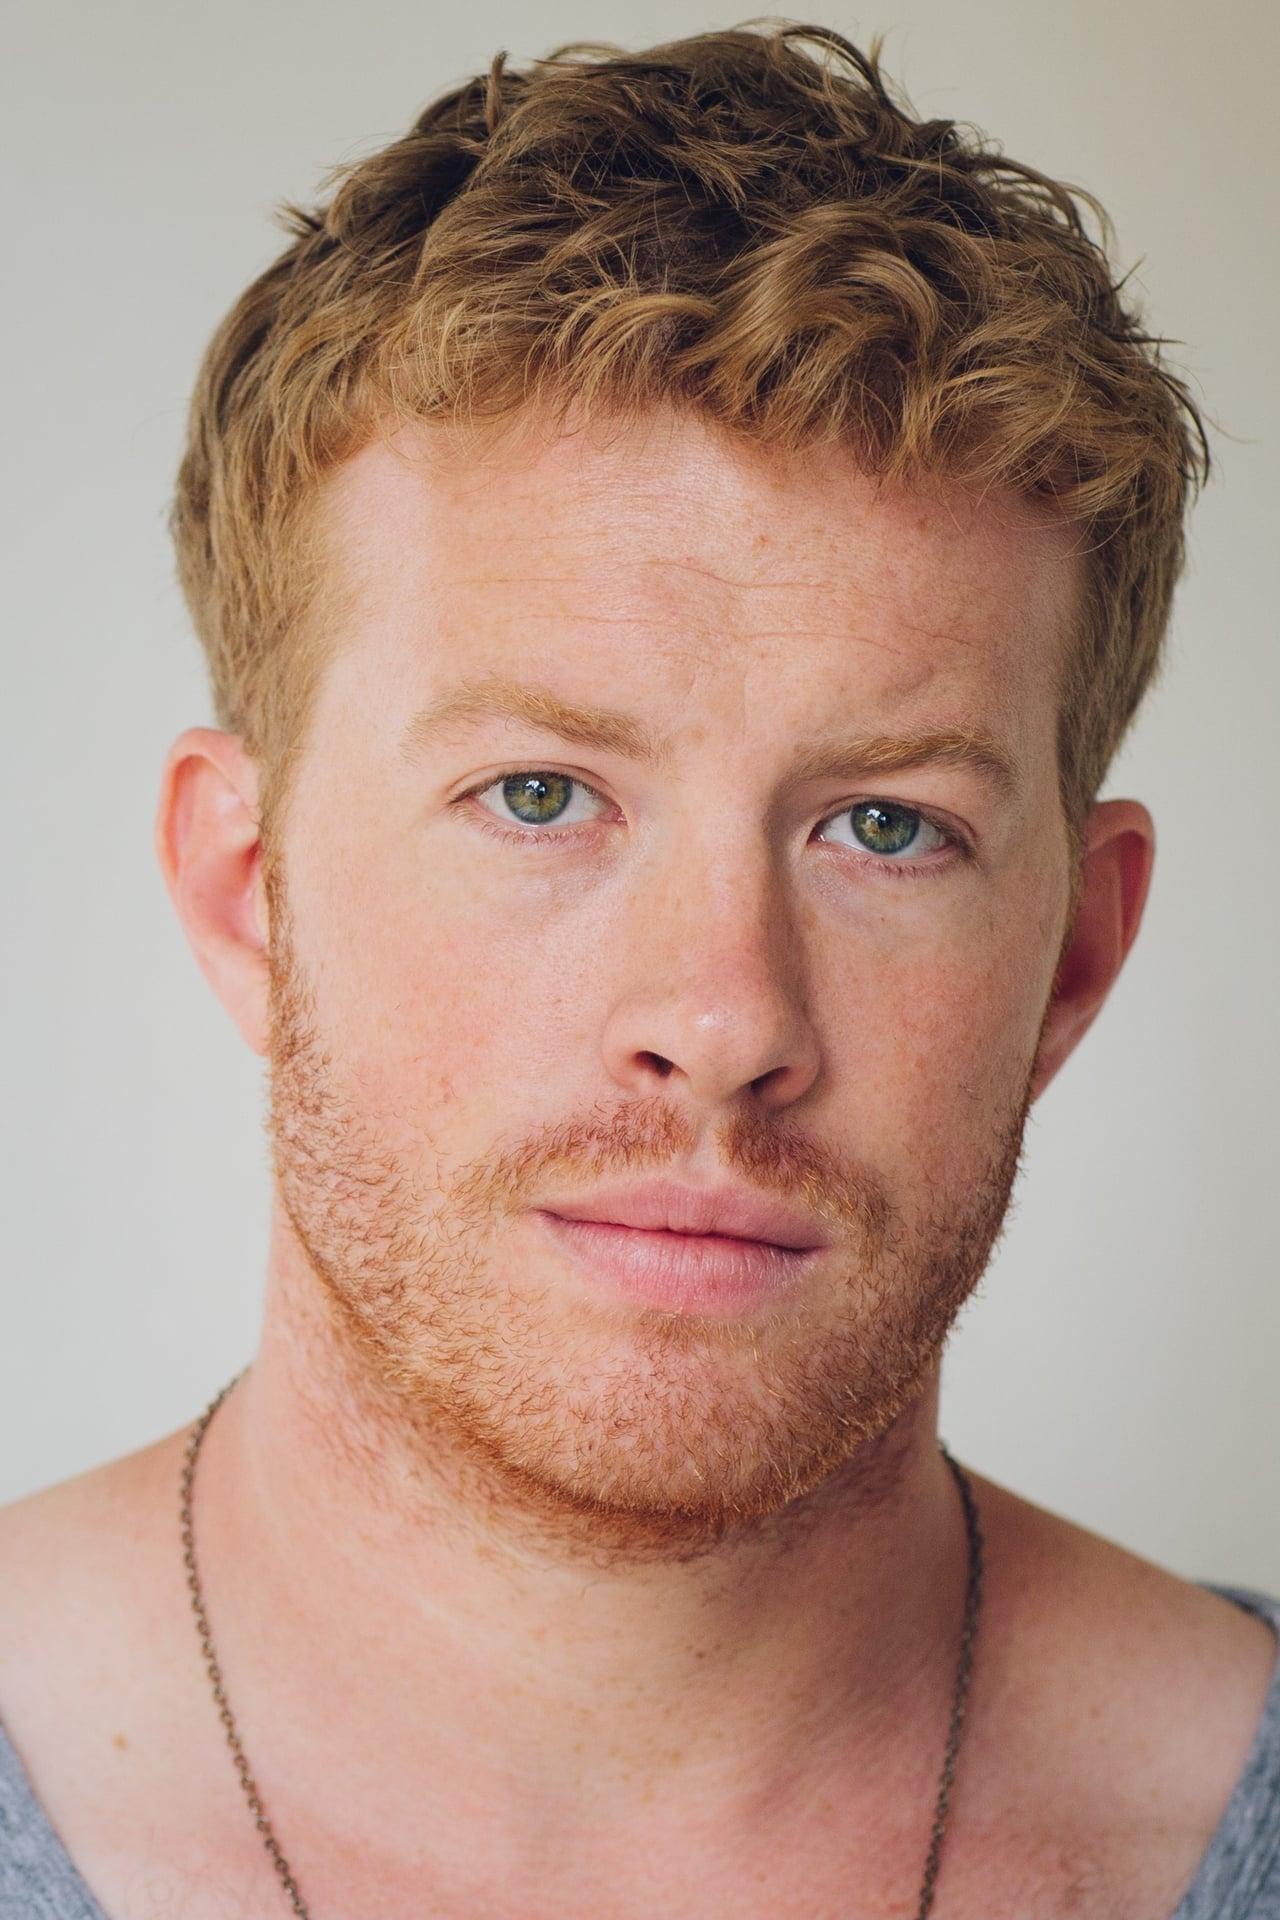 Patrick Quinlan